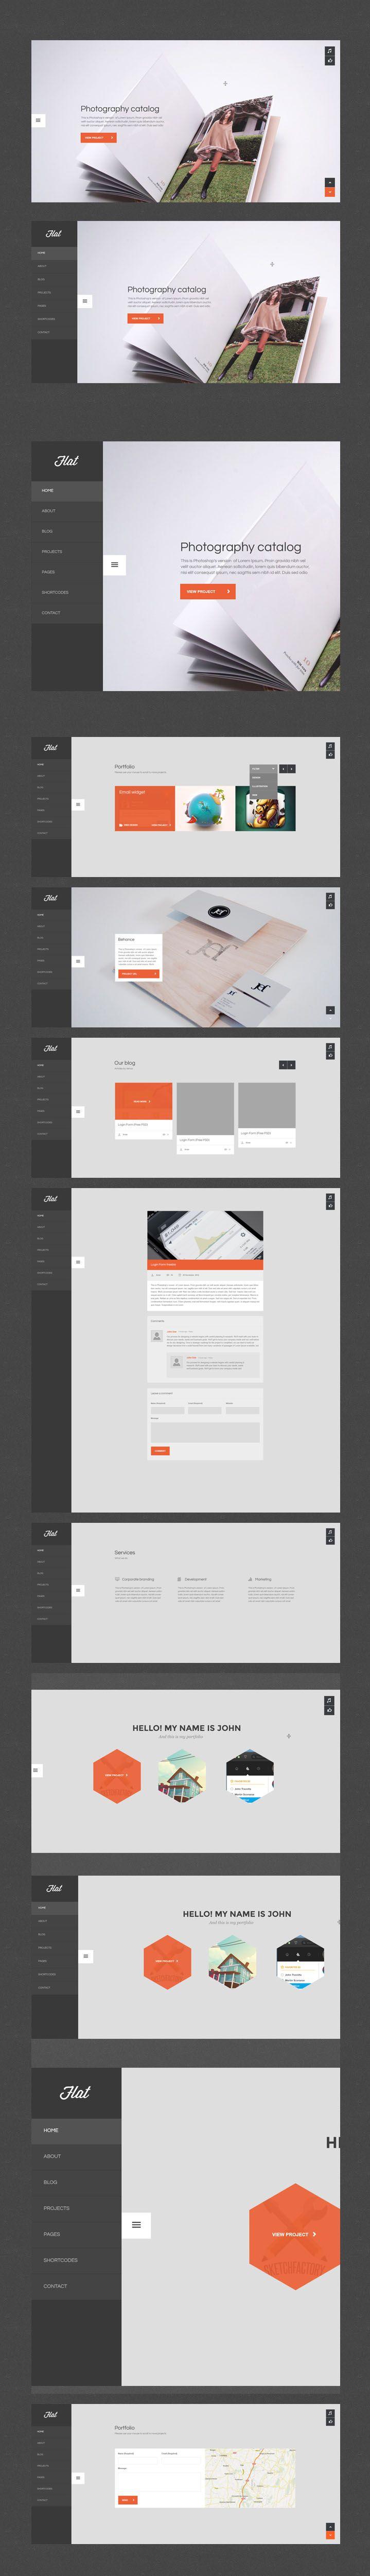 Flat ui design gui web design responsive